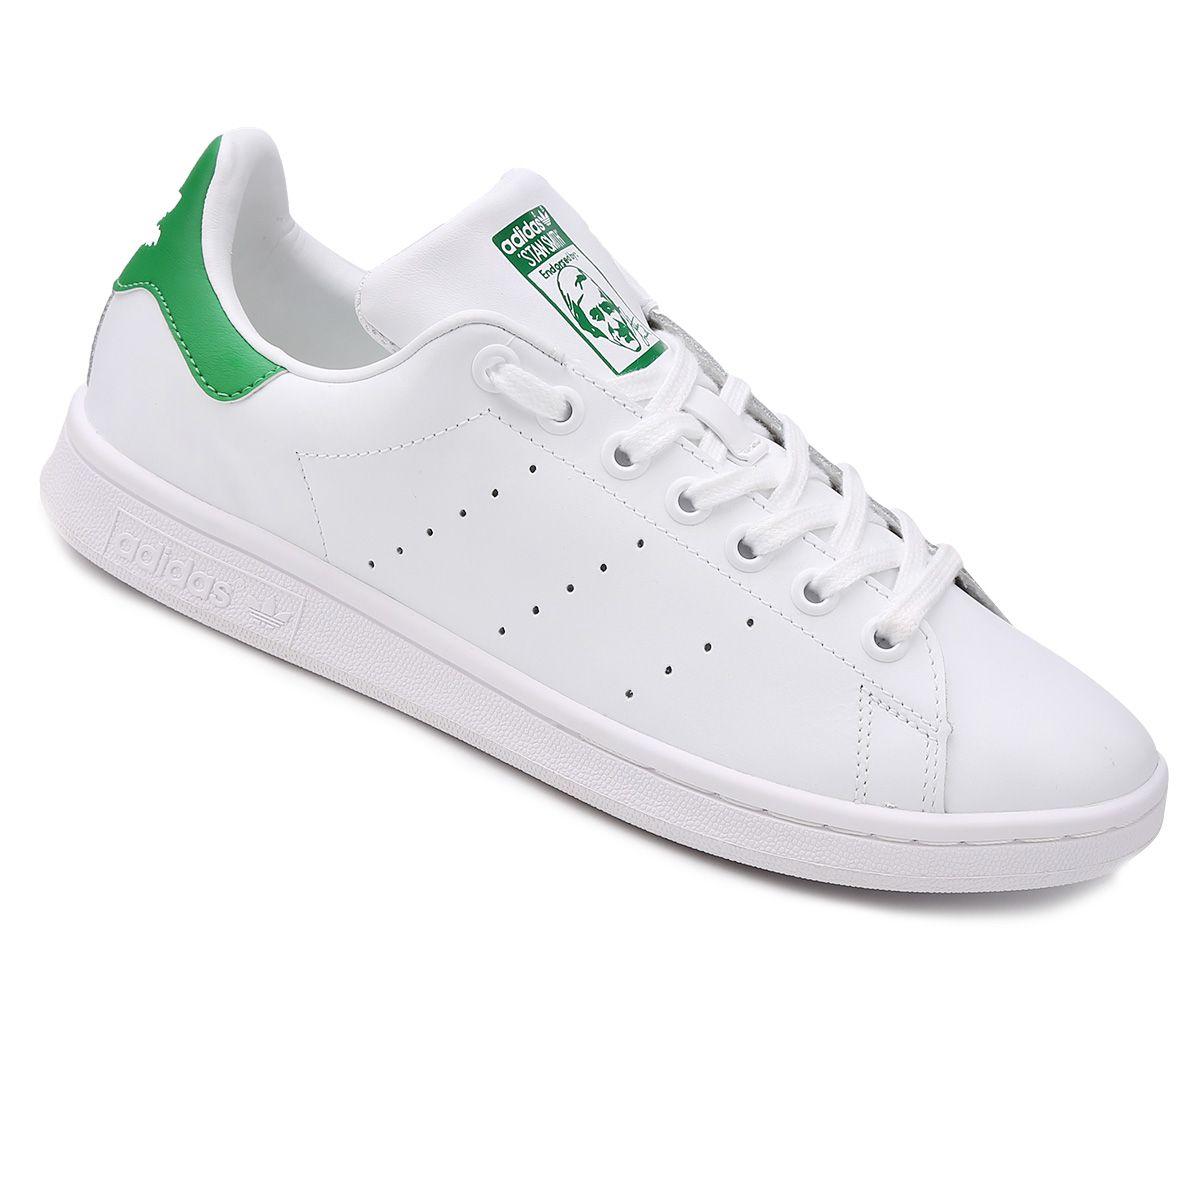 Tênis Adidas Stan Smith - Branco e Verde   Adidas stan ...